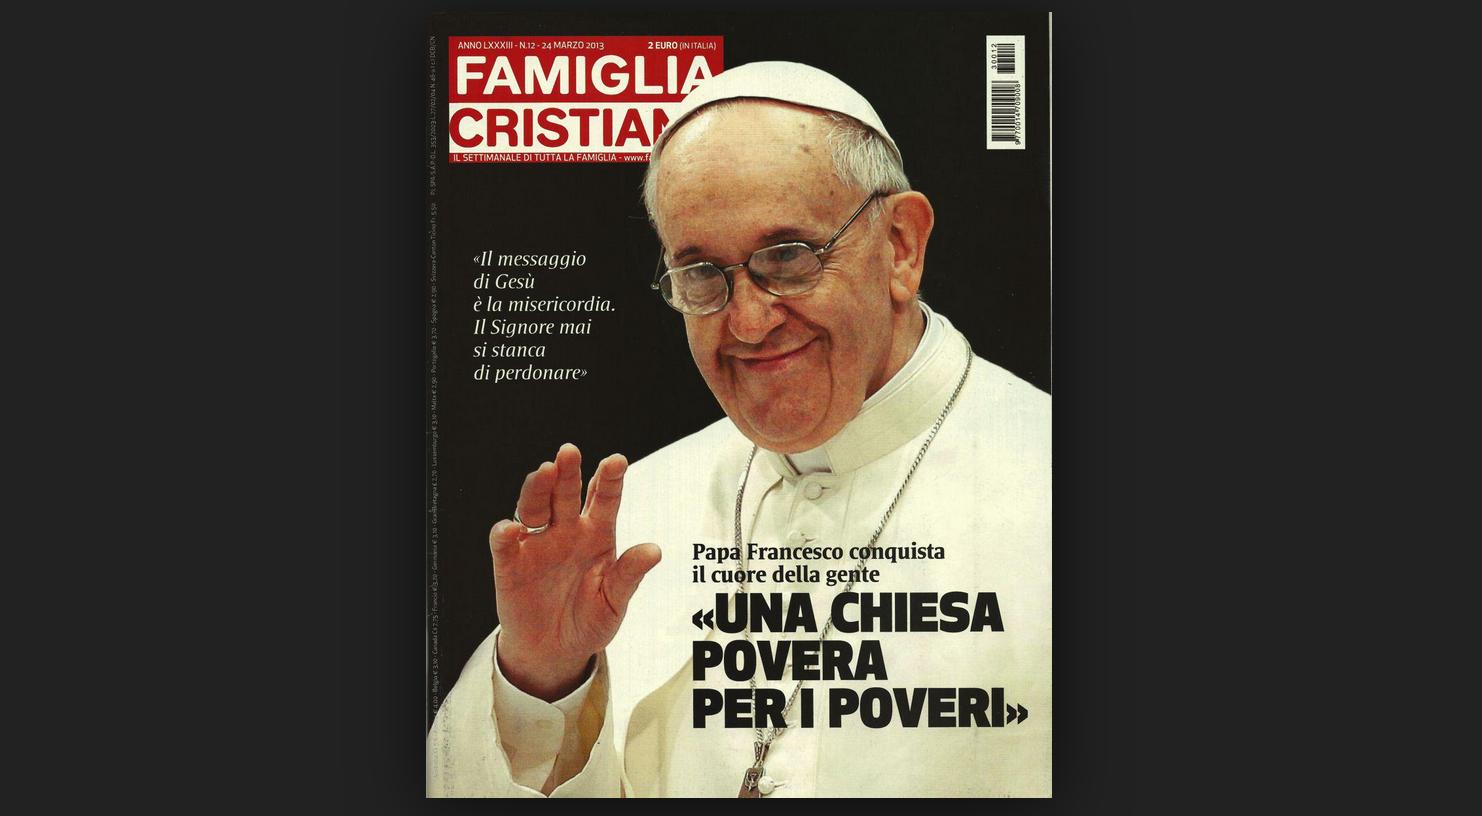 FAMIGLIA-CRISTIANA